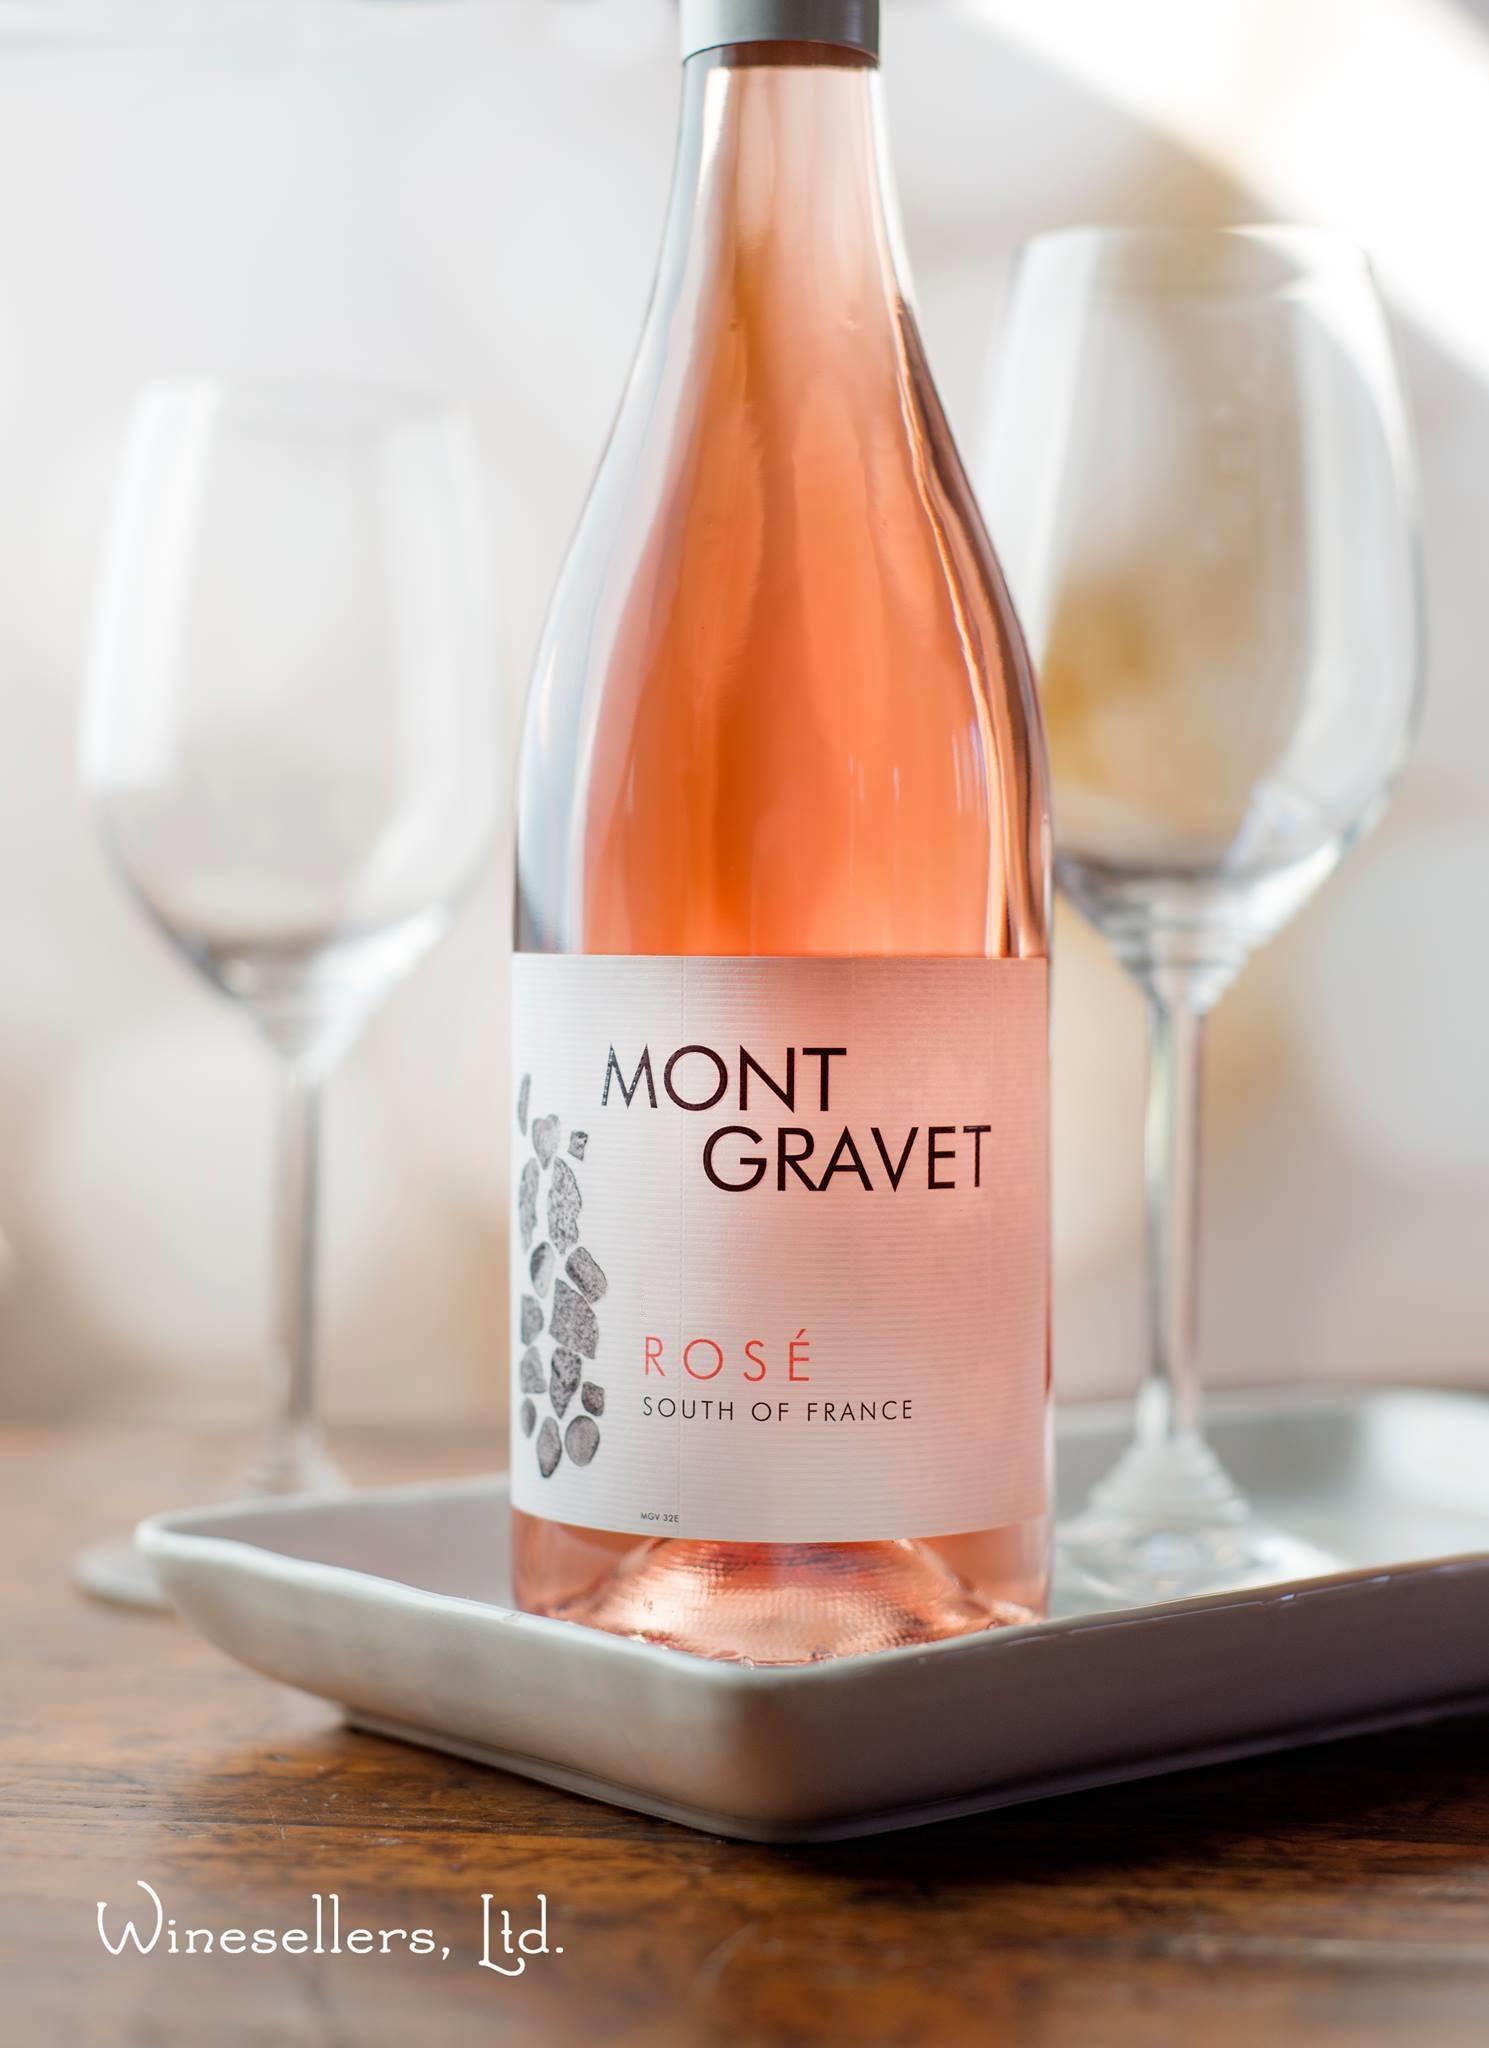 courtesy Winesellers, Ltd.